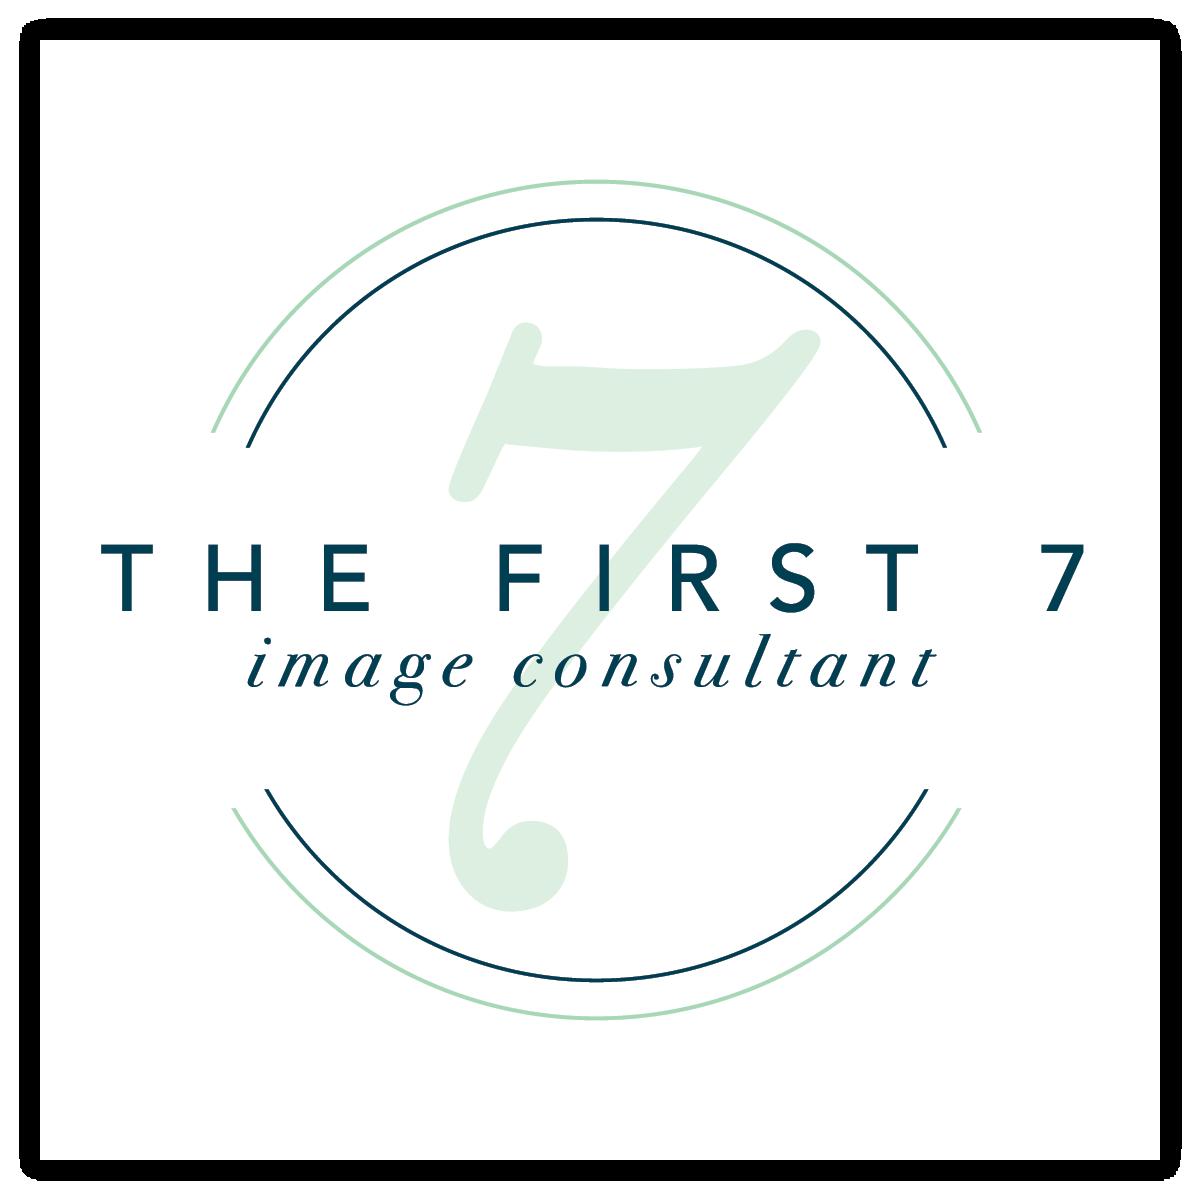 Logo Images14.png